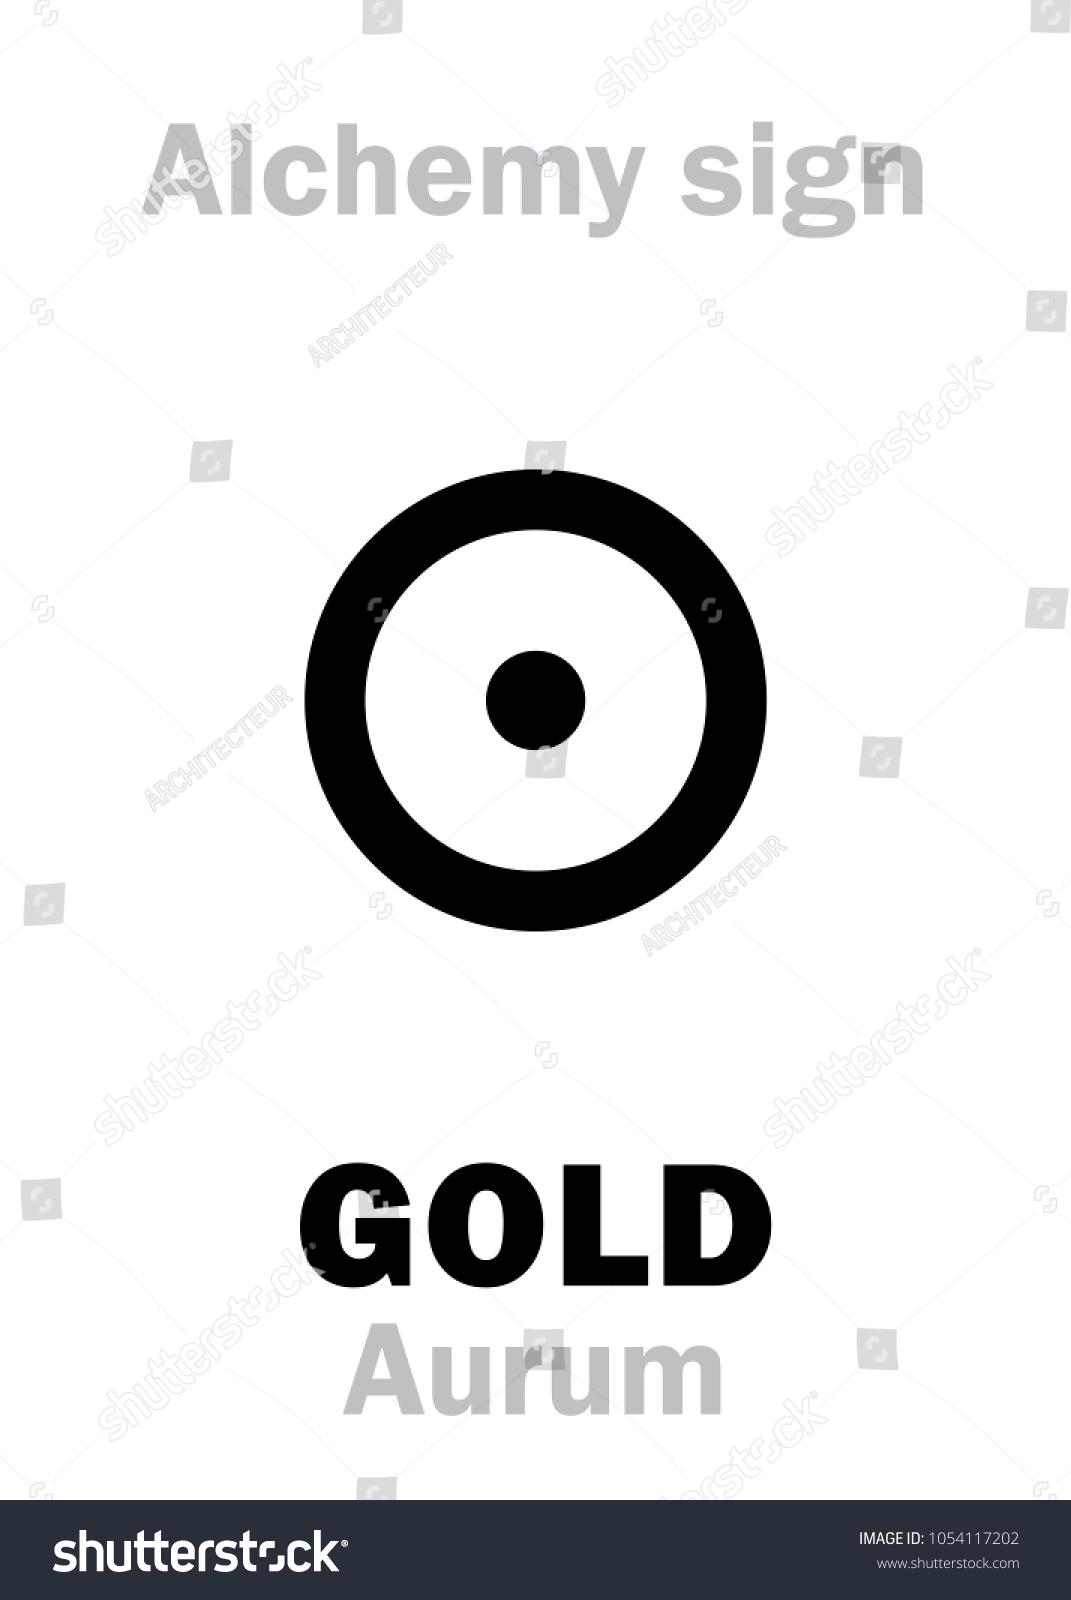 Alchemy alphabet gold aurum sol metal stock vector 1054117202 alchemy alphabet gold aurum sol metal of the sun precious biocorpaavc Gallery